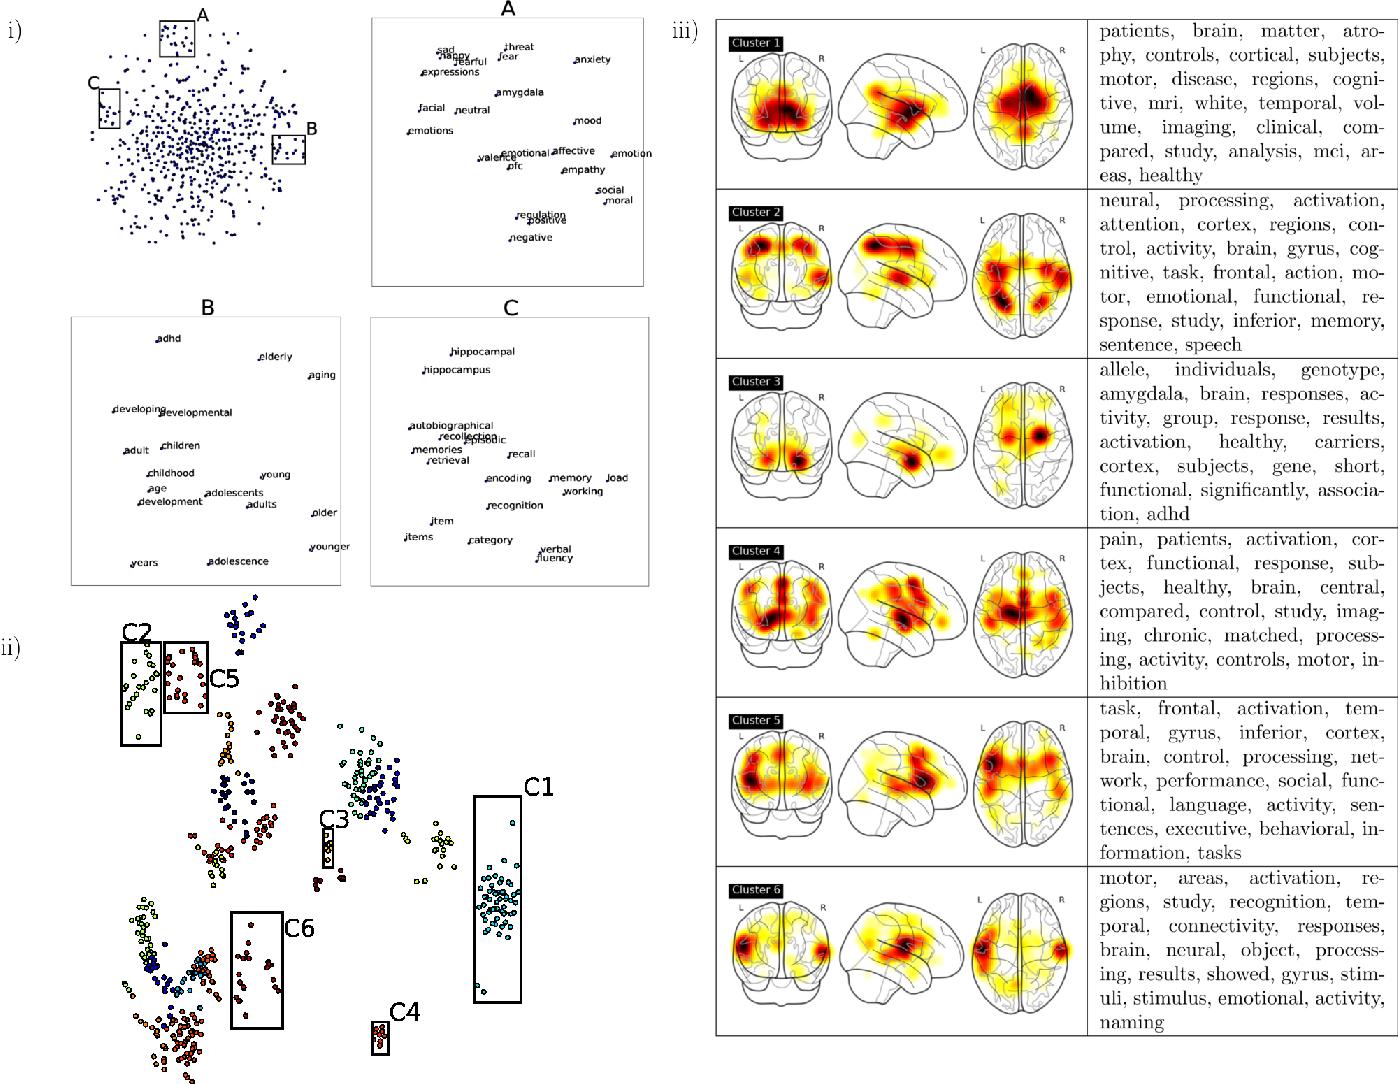 Figure 1 for Text-mining the NeuroSynth corpus using Deep Boltzmann Machines